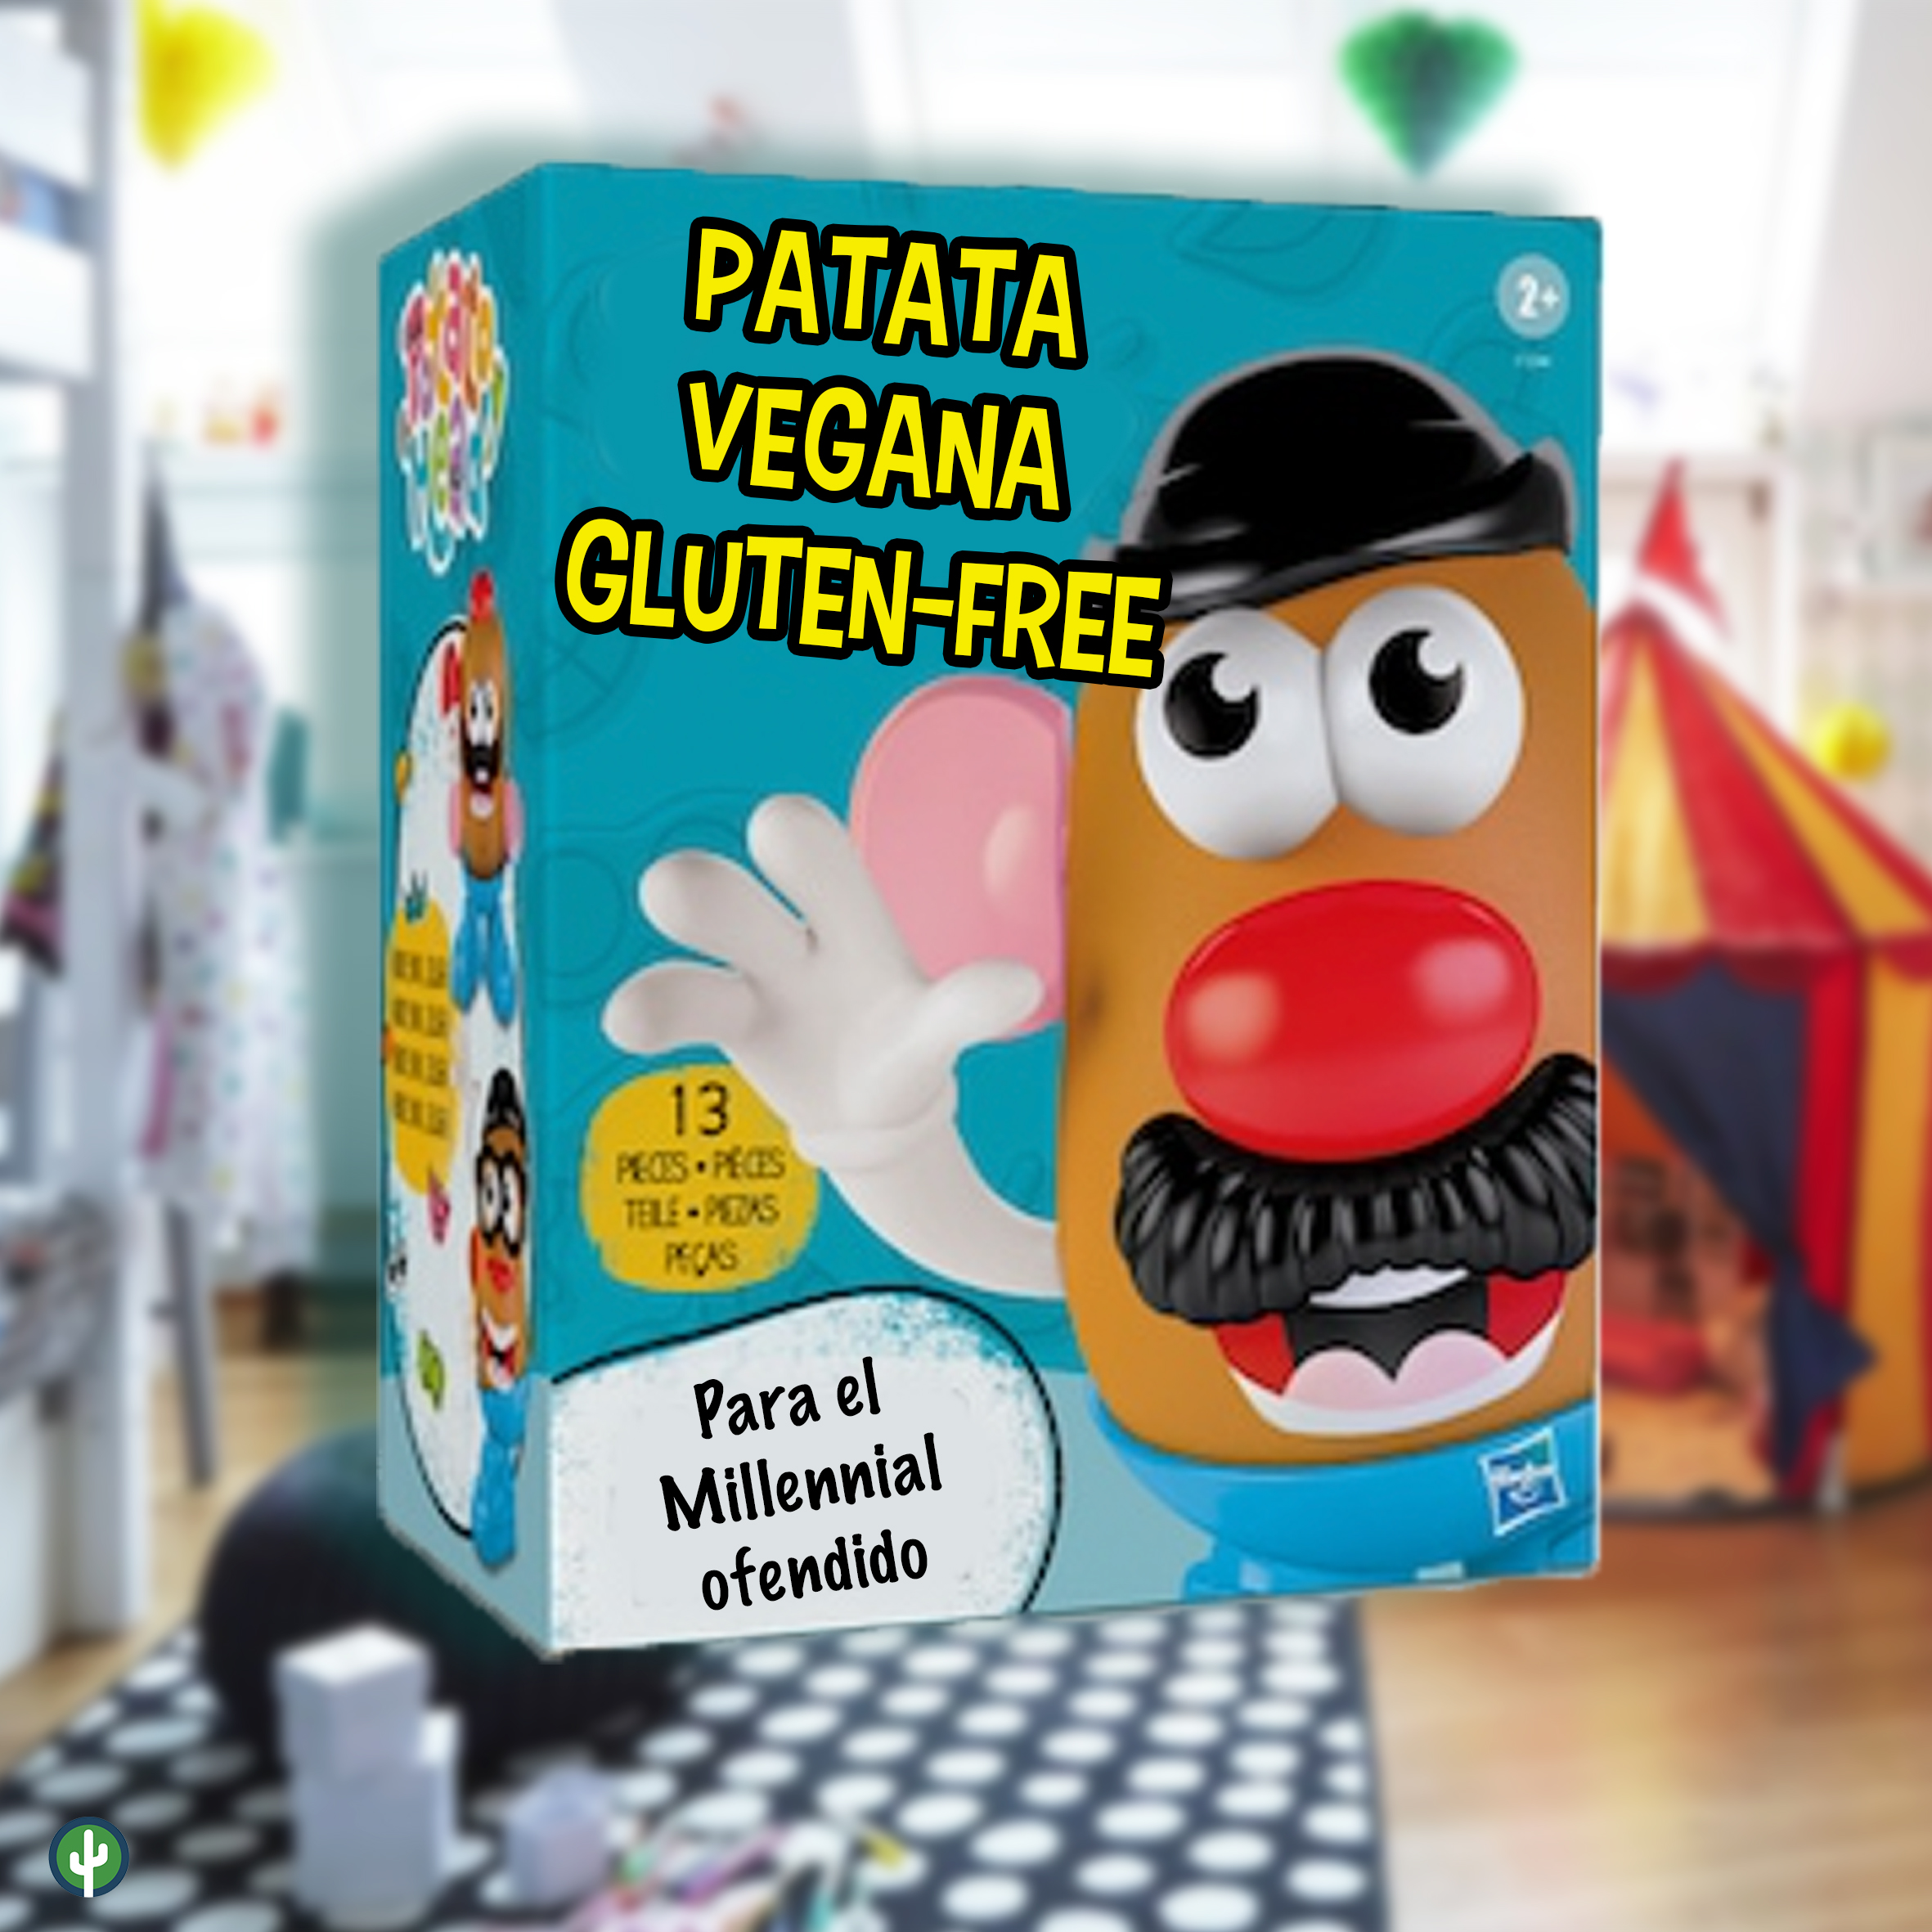 Mr Potato Head Vegan Gluten Free